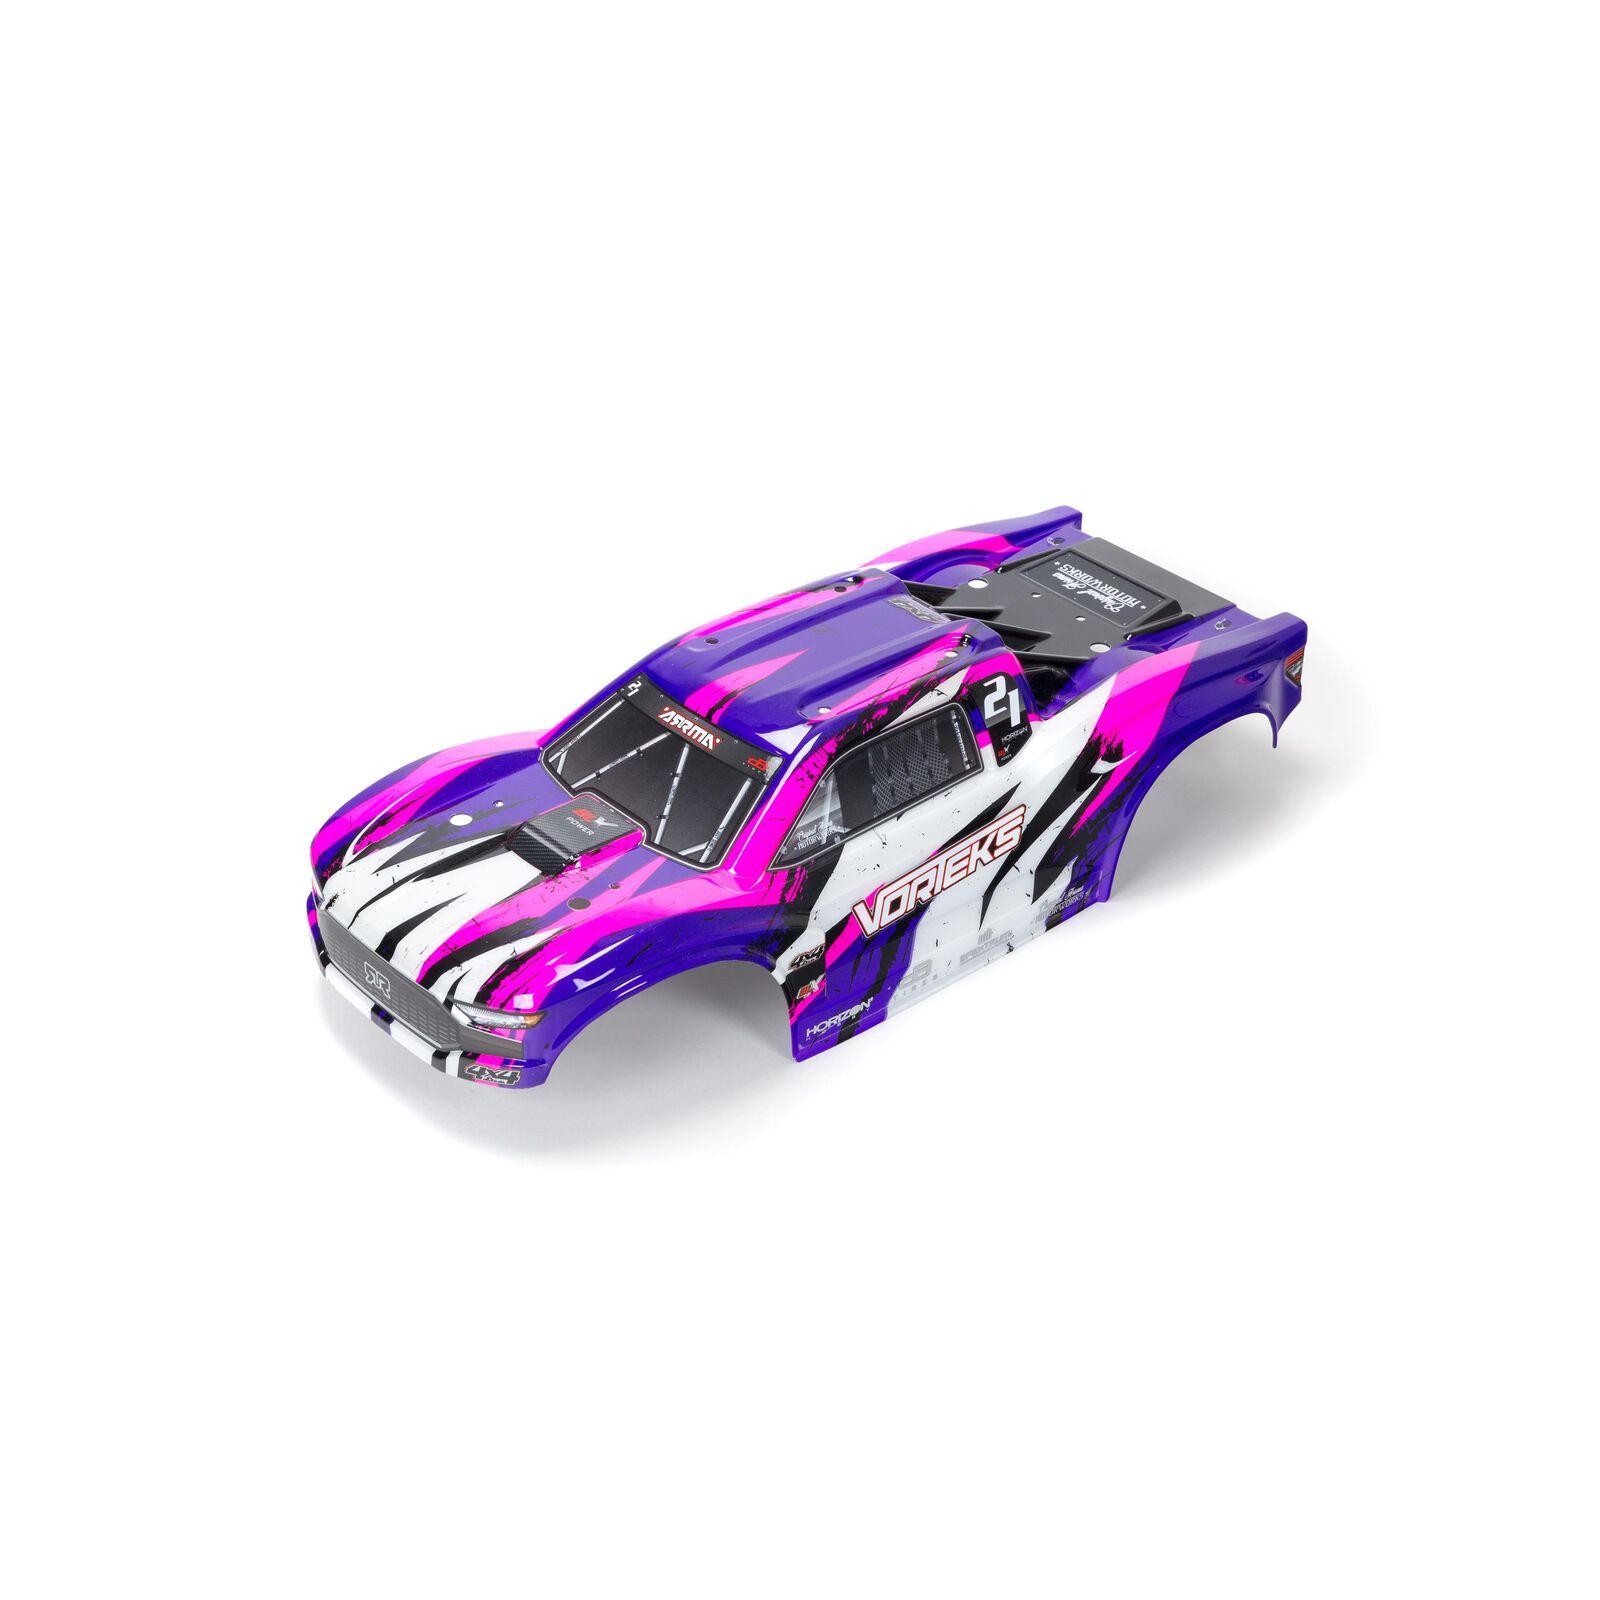 VORTEKS 4X4 BLX Painted Decal Trimmed Body(Purple)